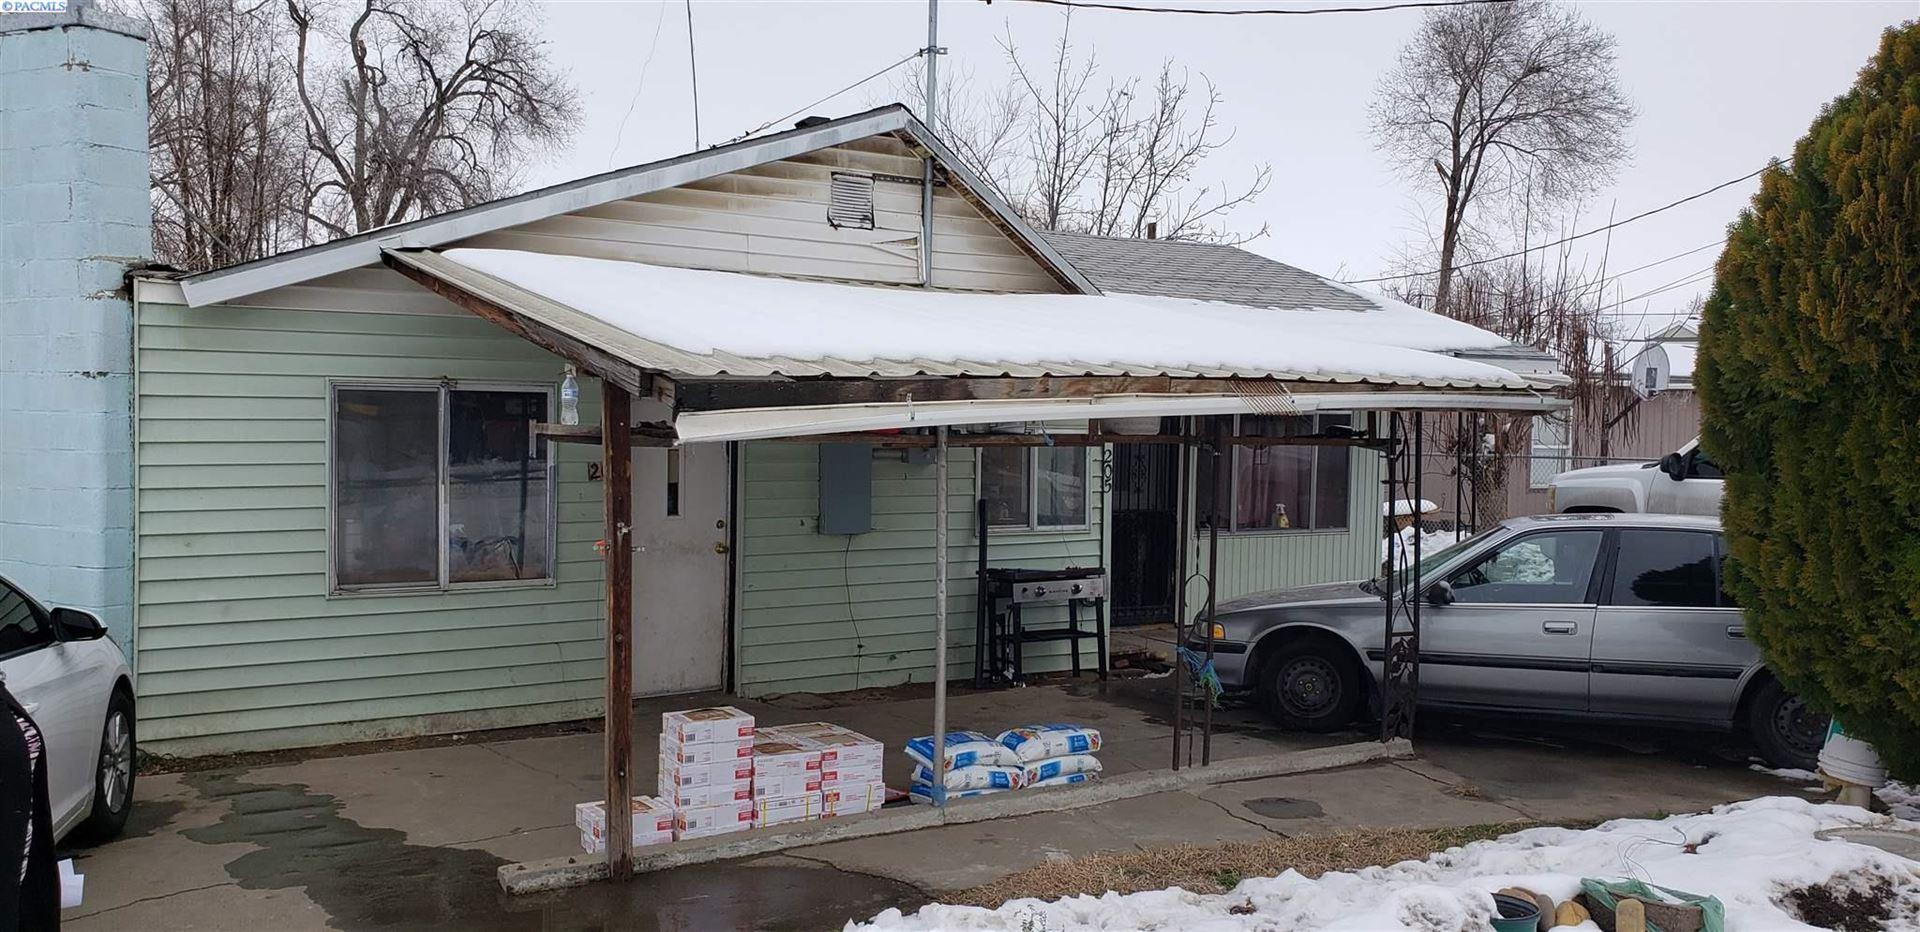 Photo of 205 3rd Ave, Granger, WA 98932 (MLS # 252143)